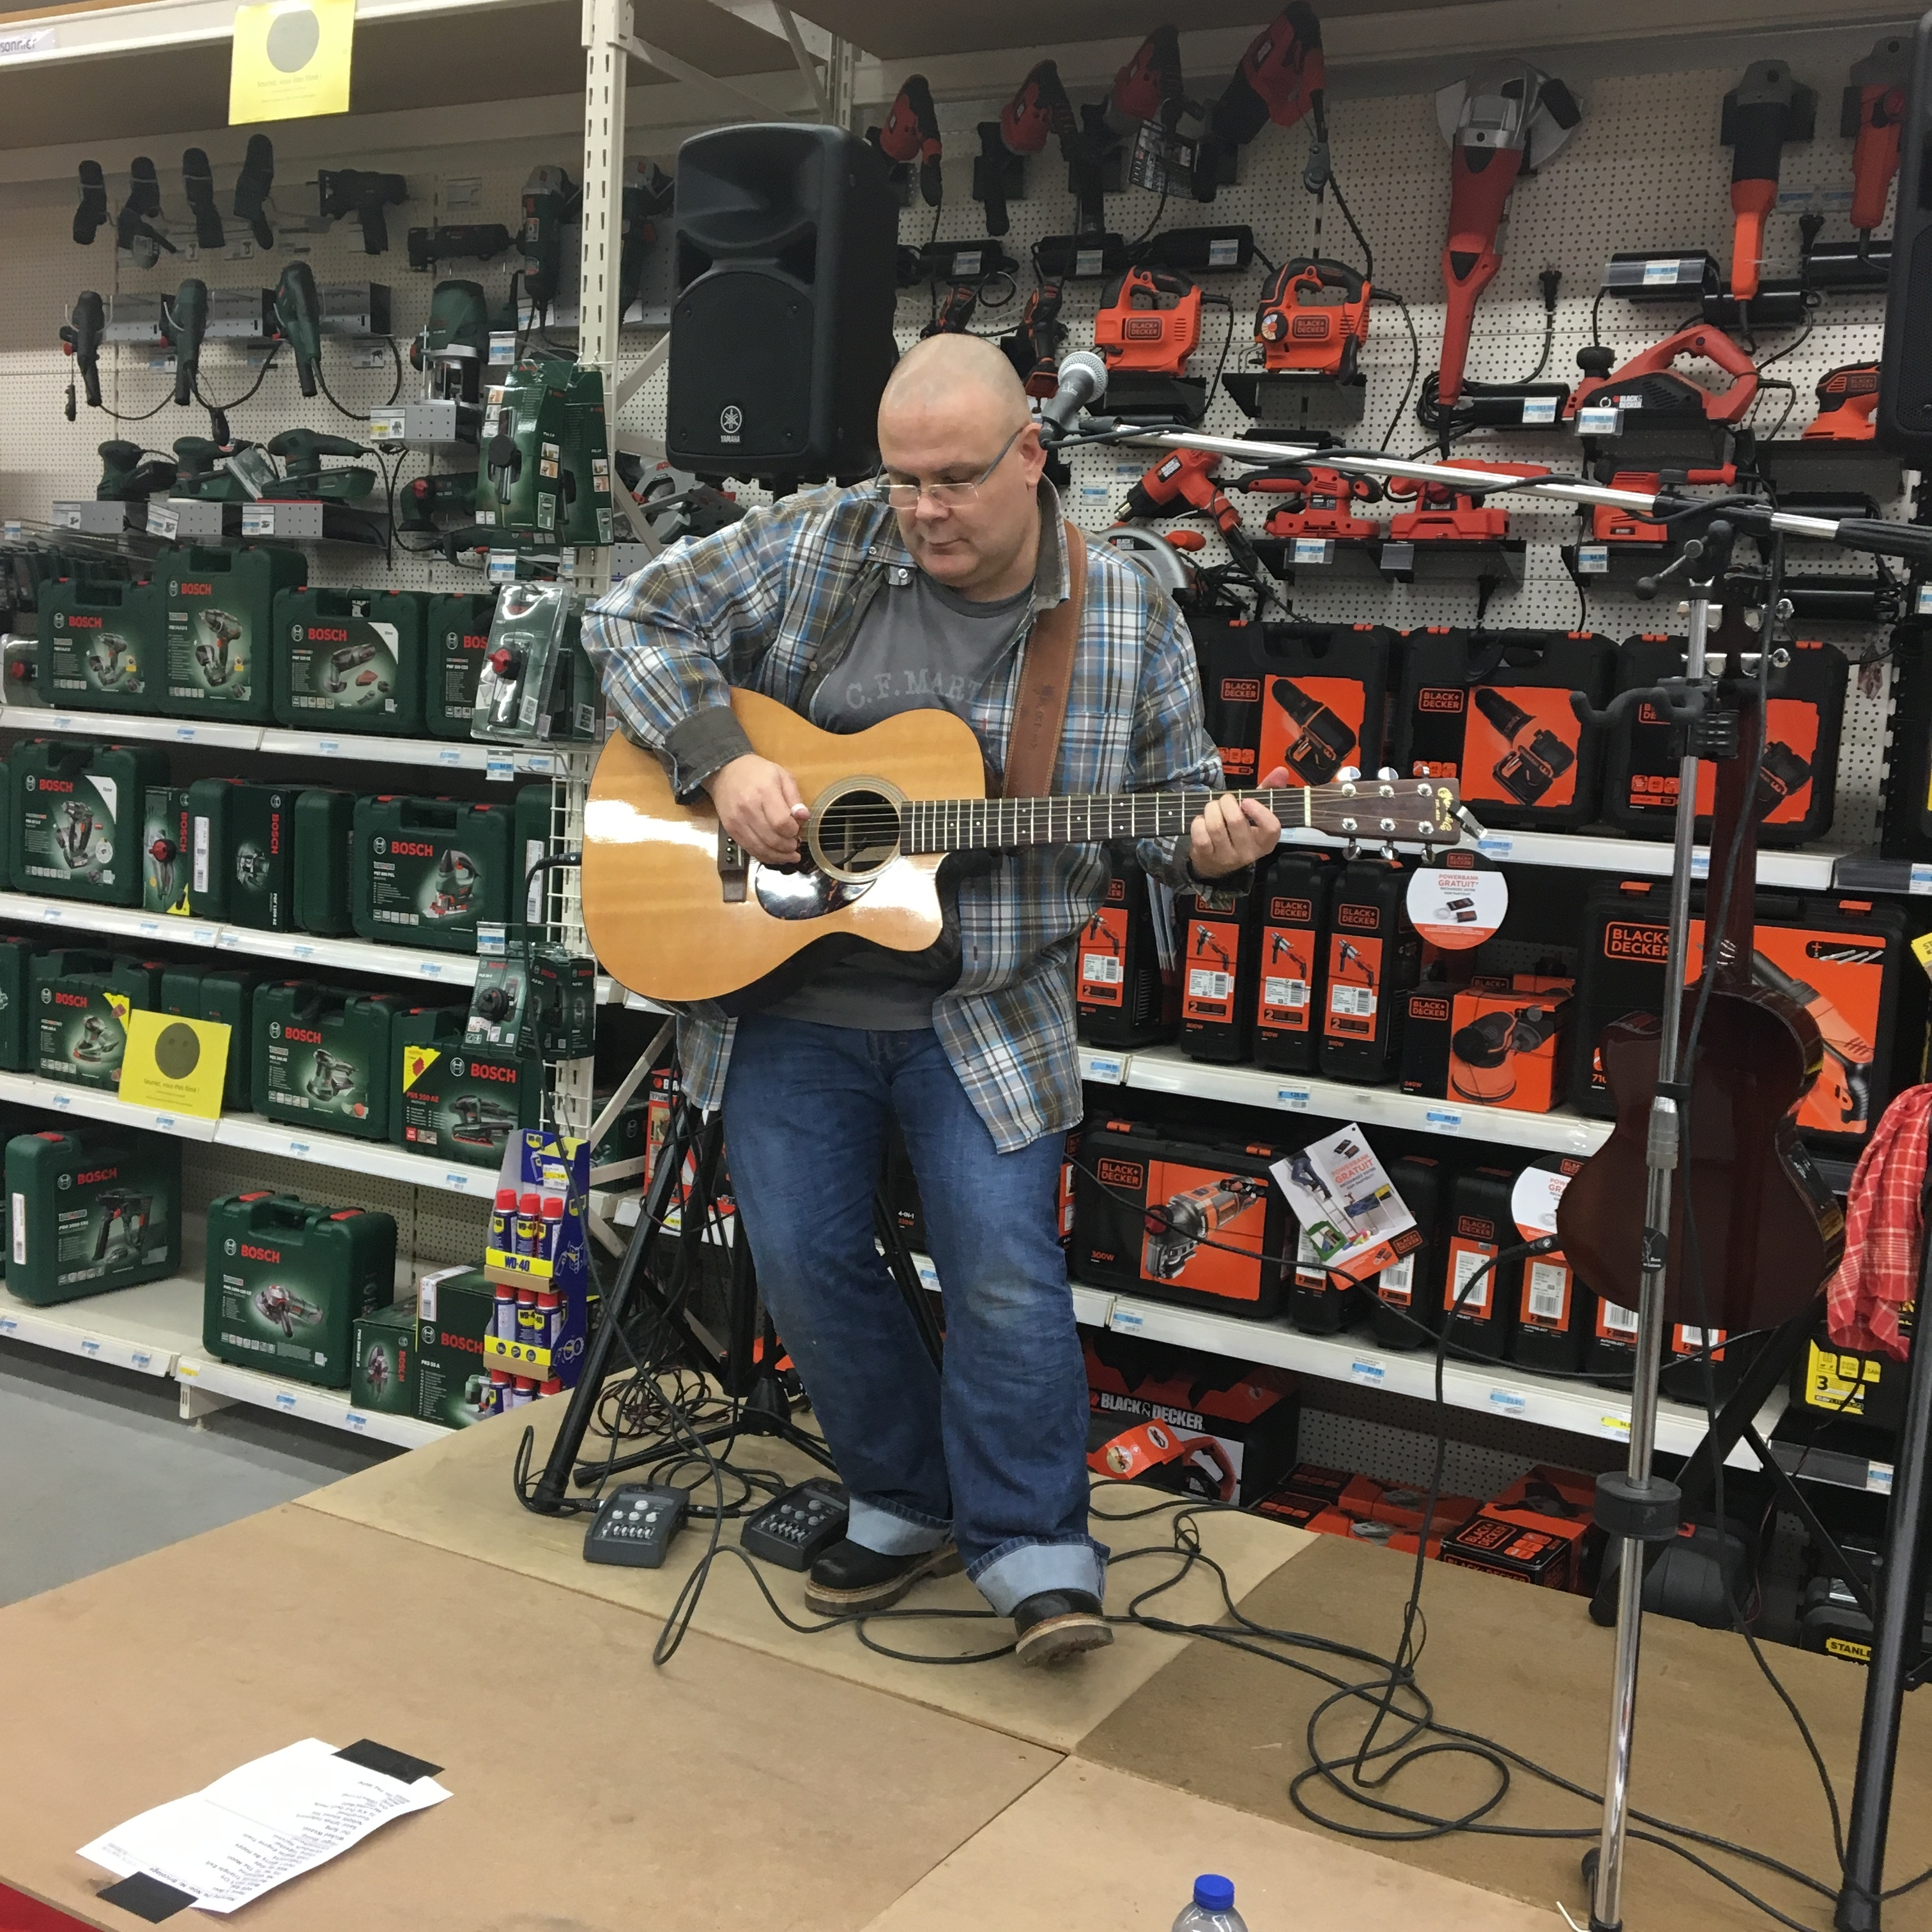 Accorder sa guitare et encore mieux accorder sa guitare ma guitare et vous - Magasin bricolage villeurbanne ...